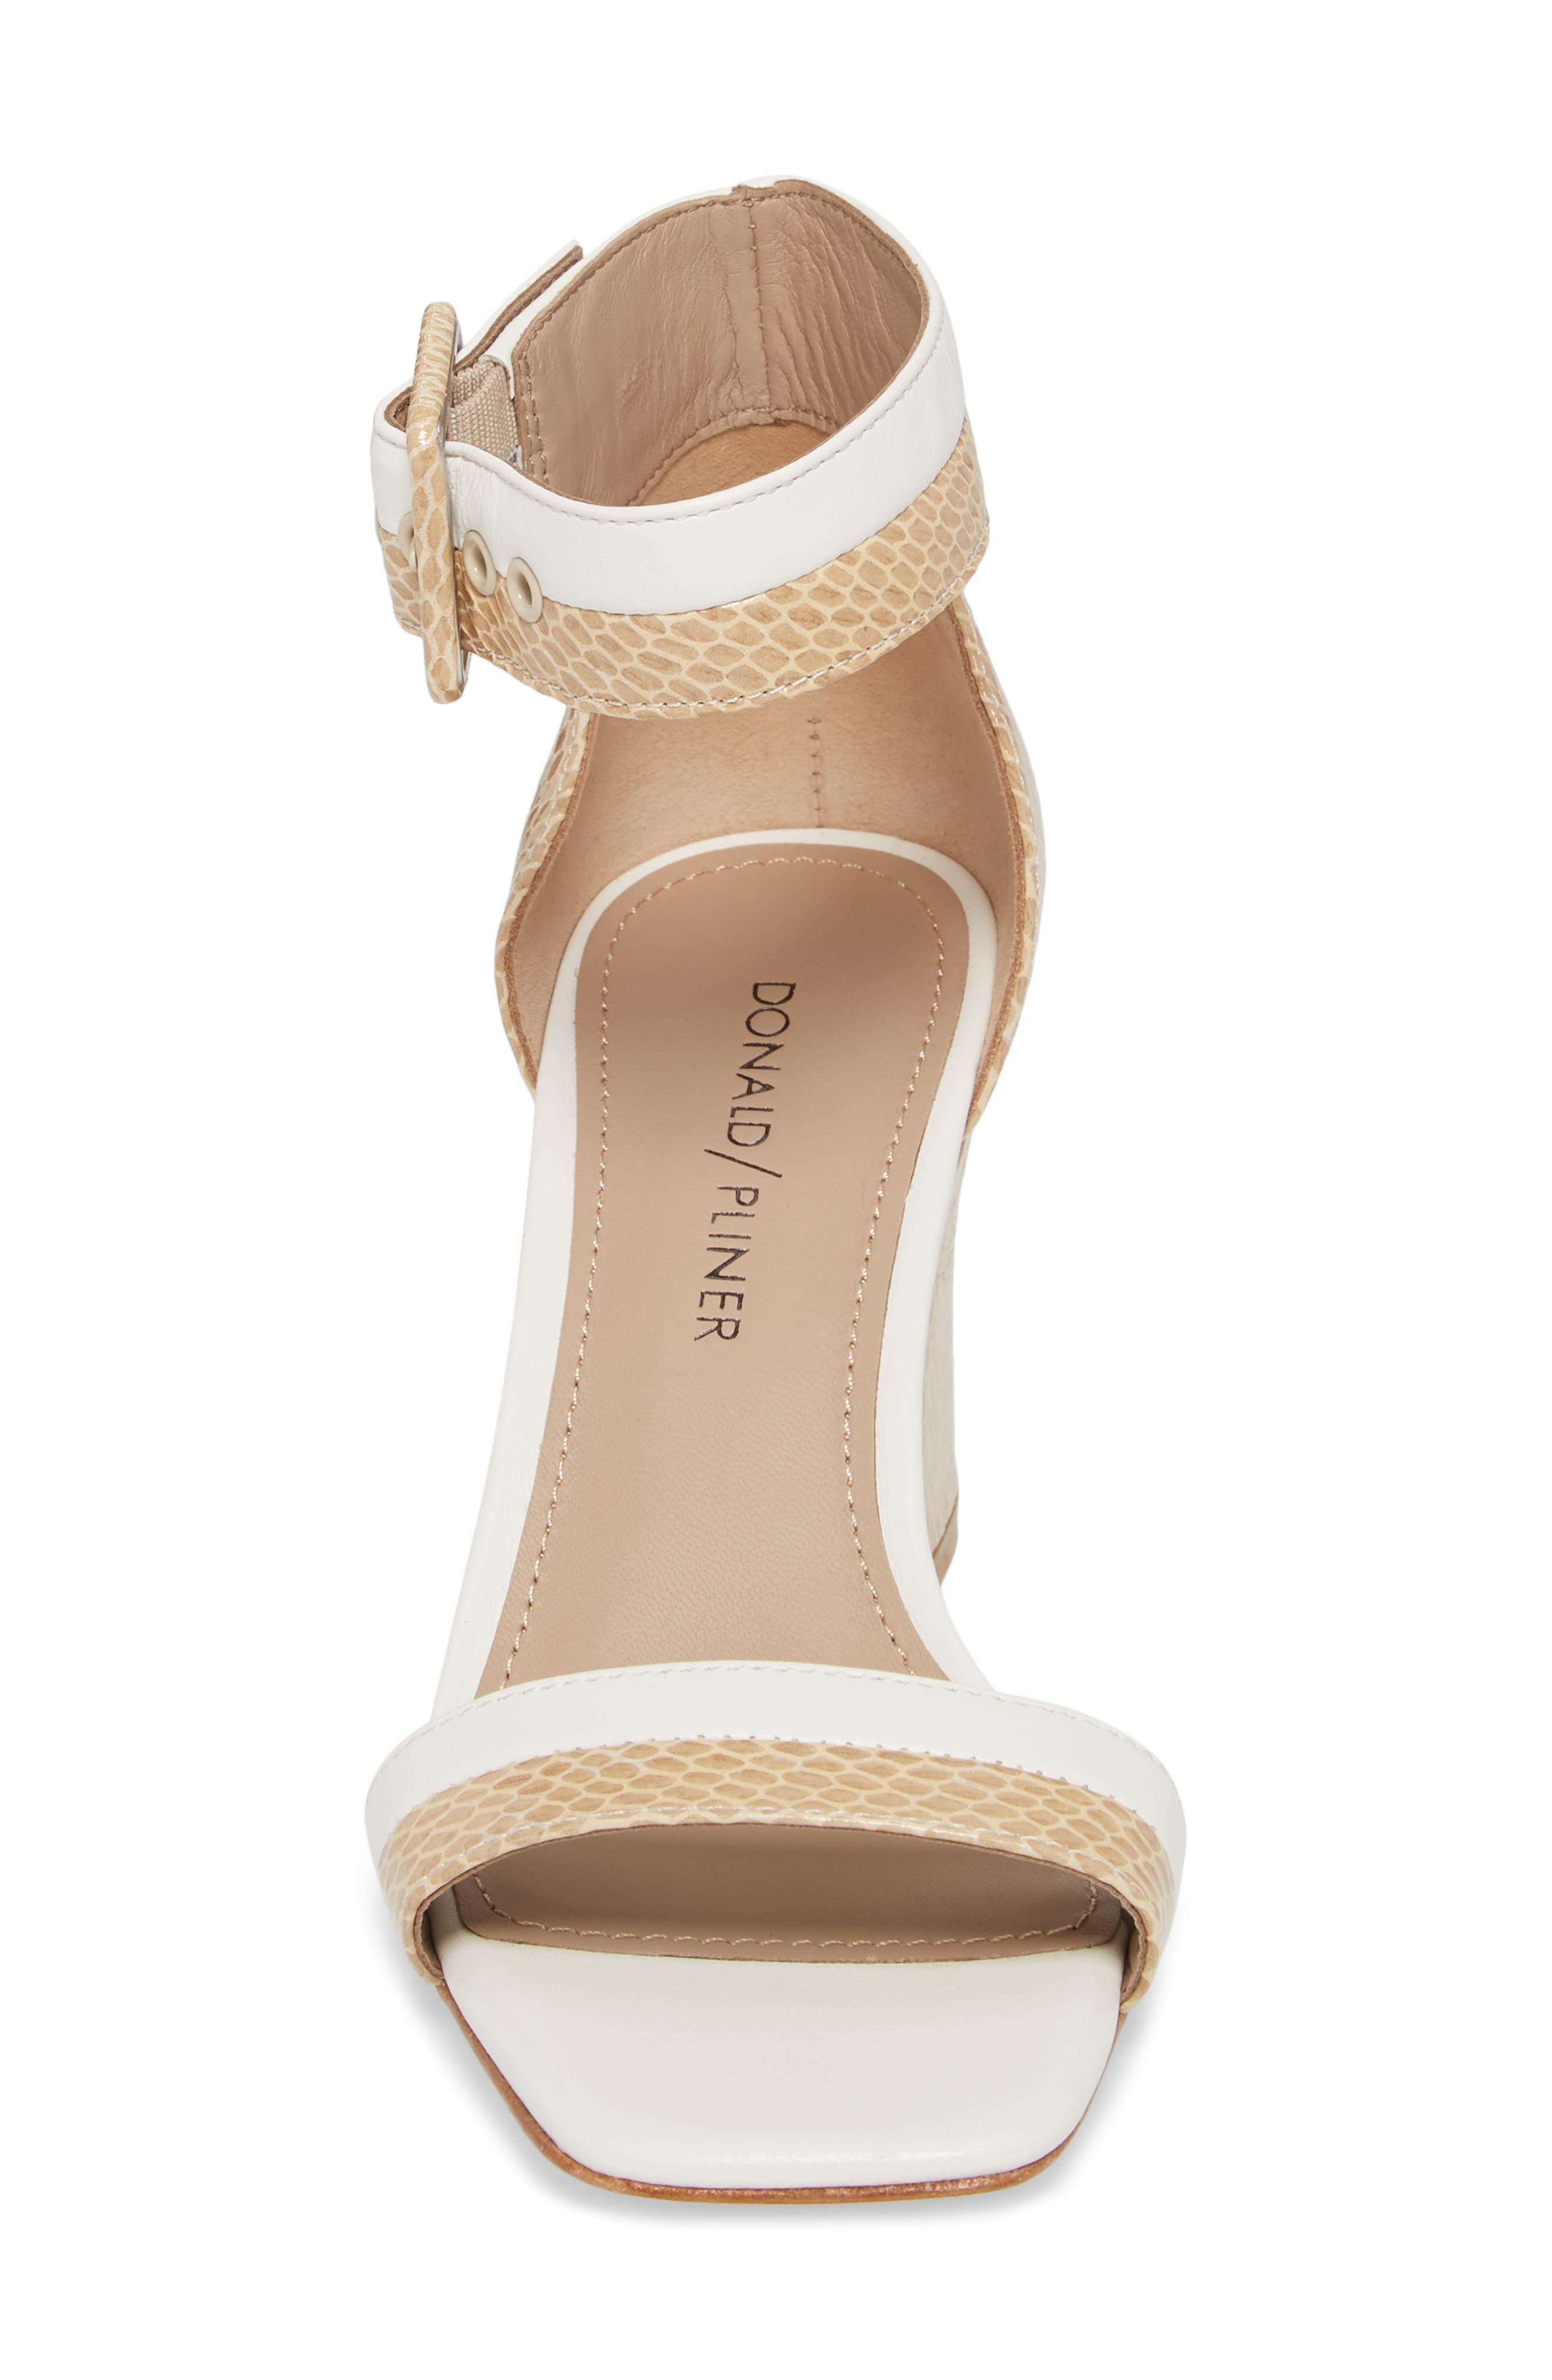 DONALD PLINER,                             Watson Ankle Strap Sandal,                             Alternate thumbnail 4, color,                             250